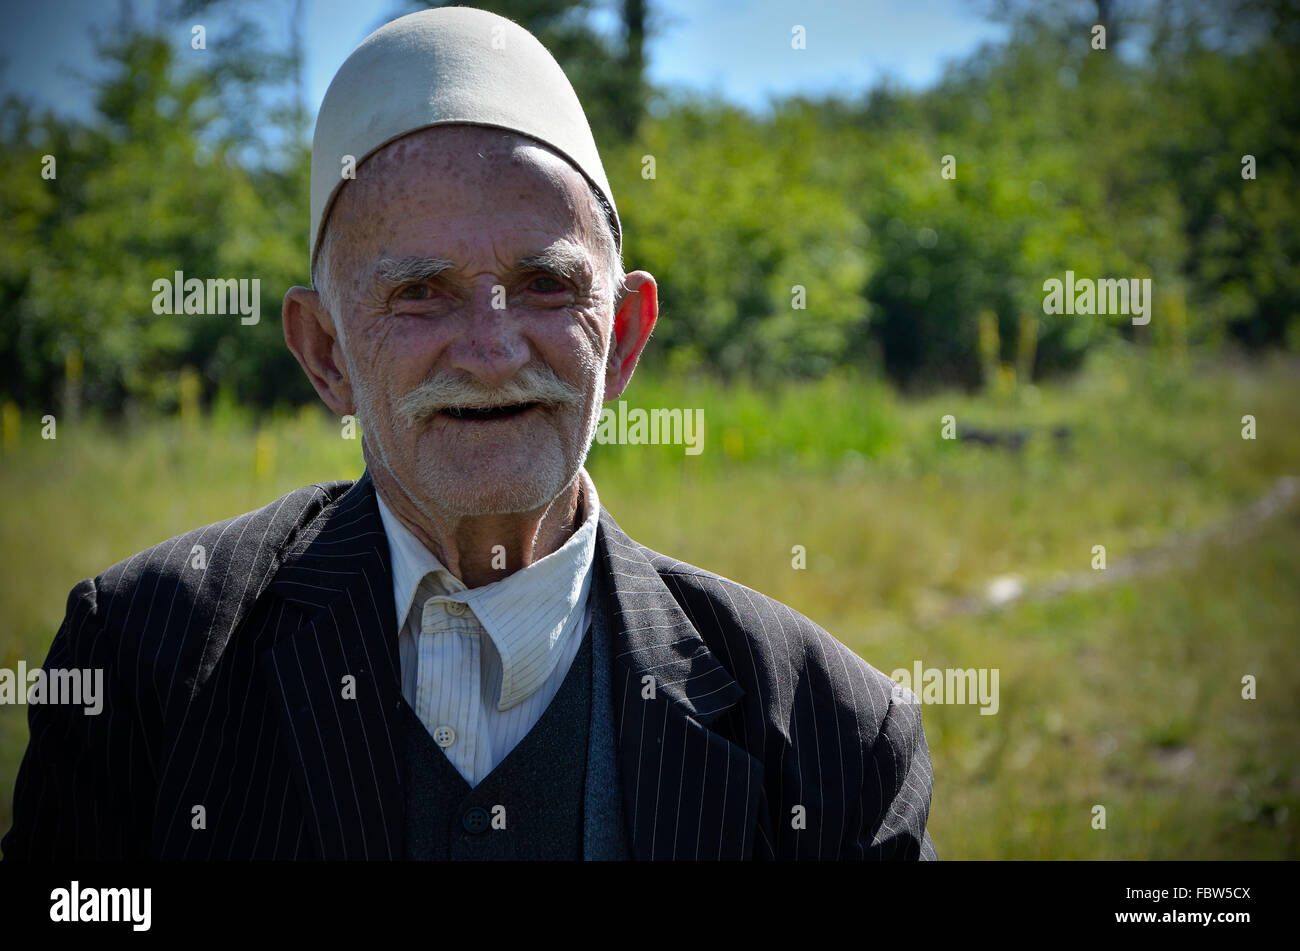 Kosovar Albanian. Balkans. War. Ethnic cleansing. Stock Photo